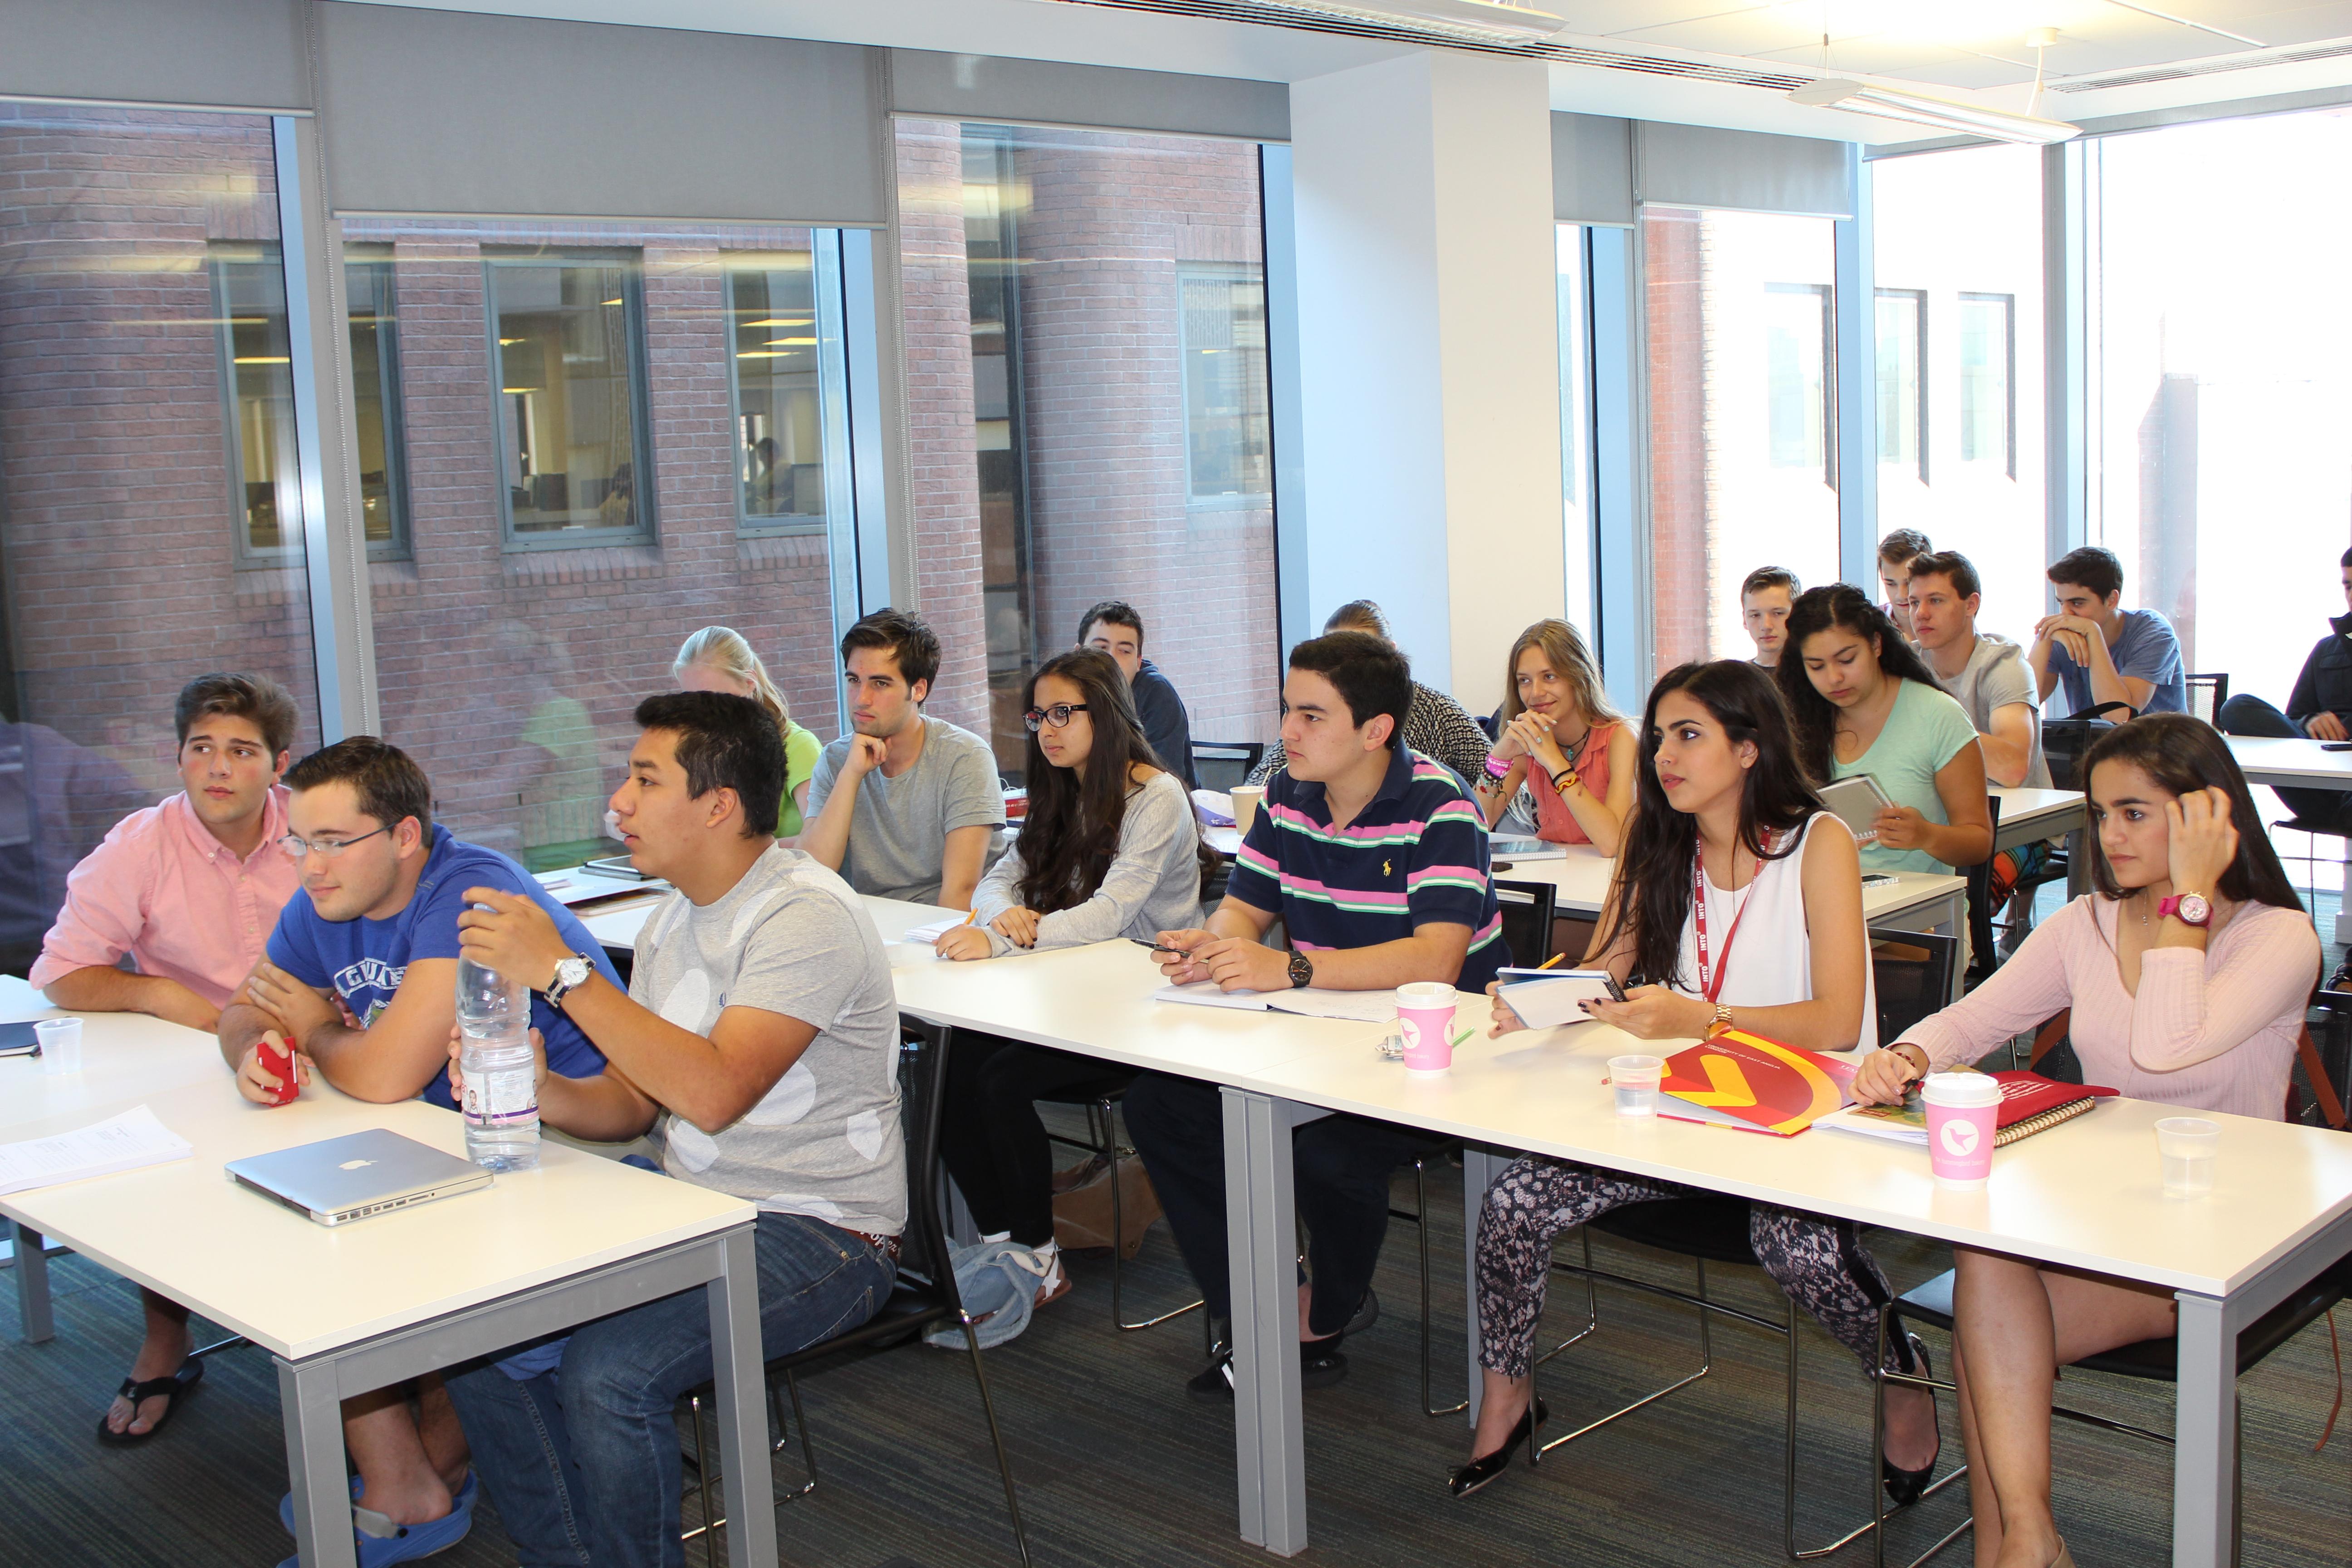 Summer Program - Entrepreneurship | Summer Discovery: City University London - International Business